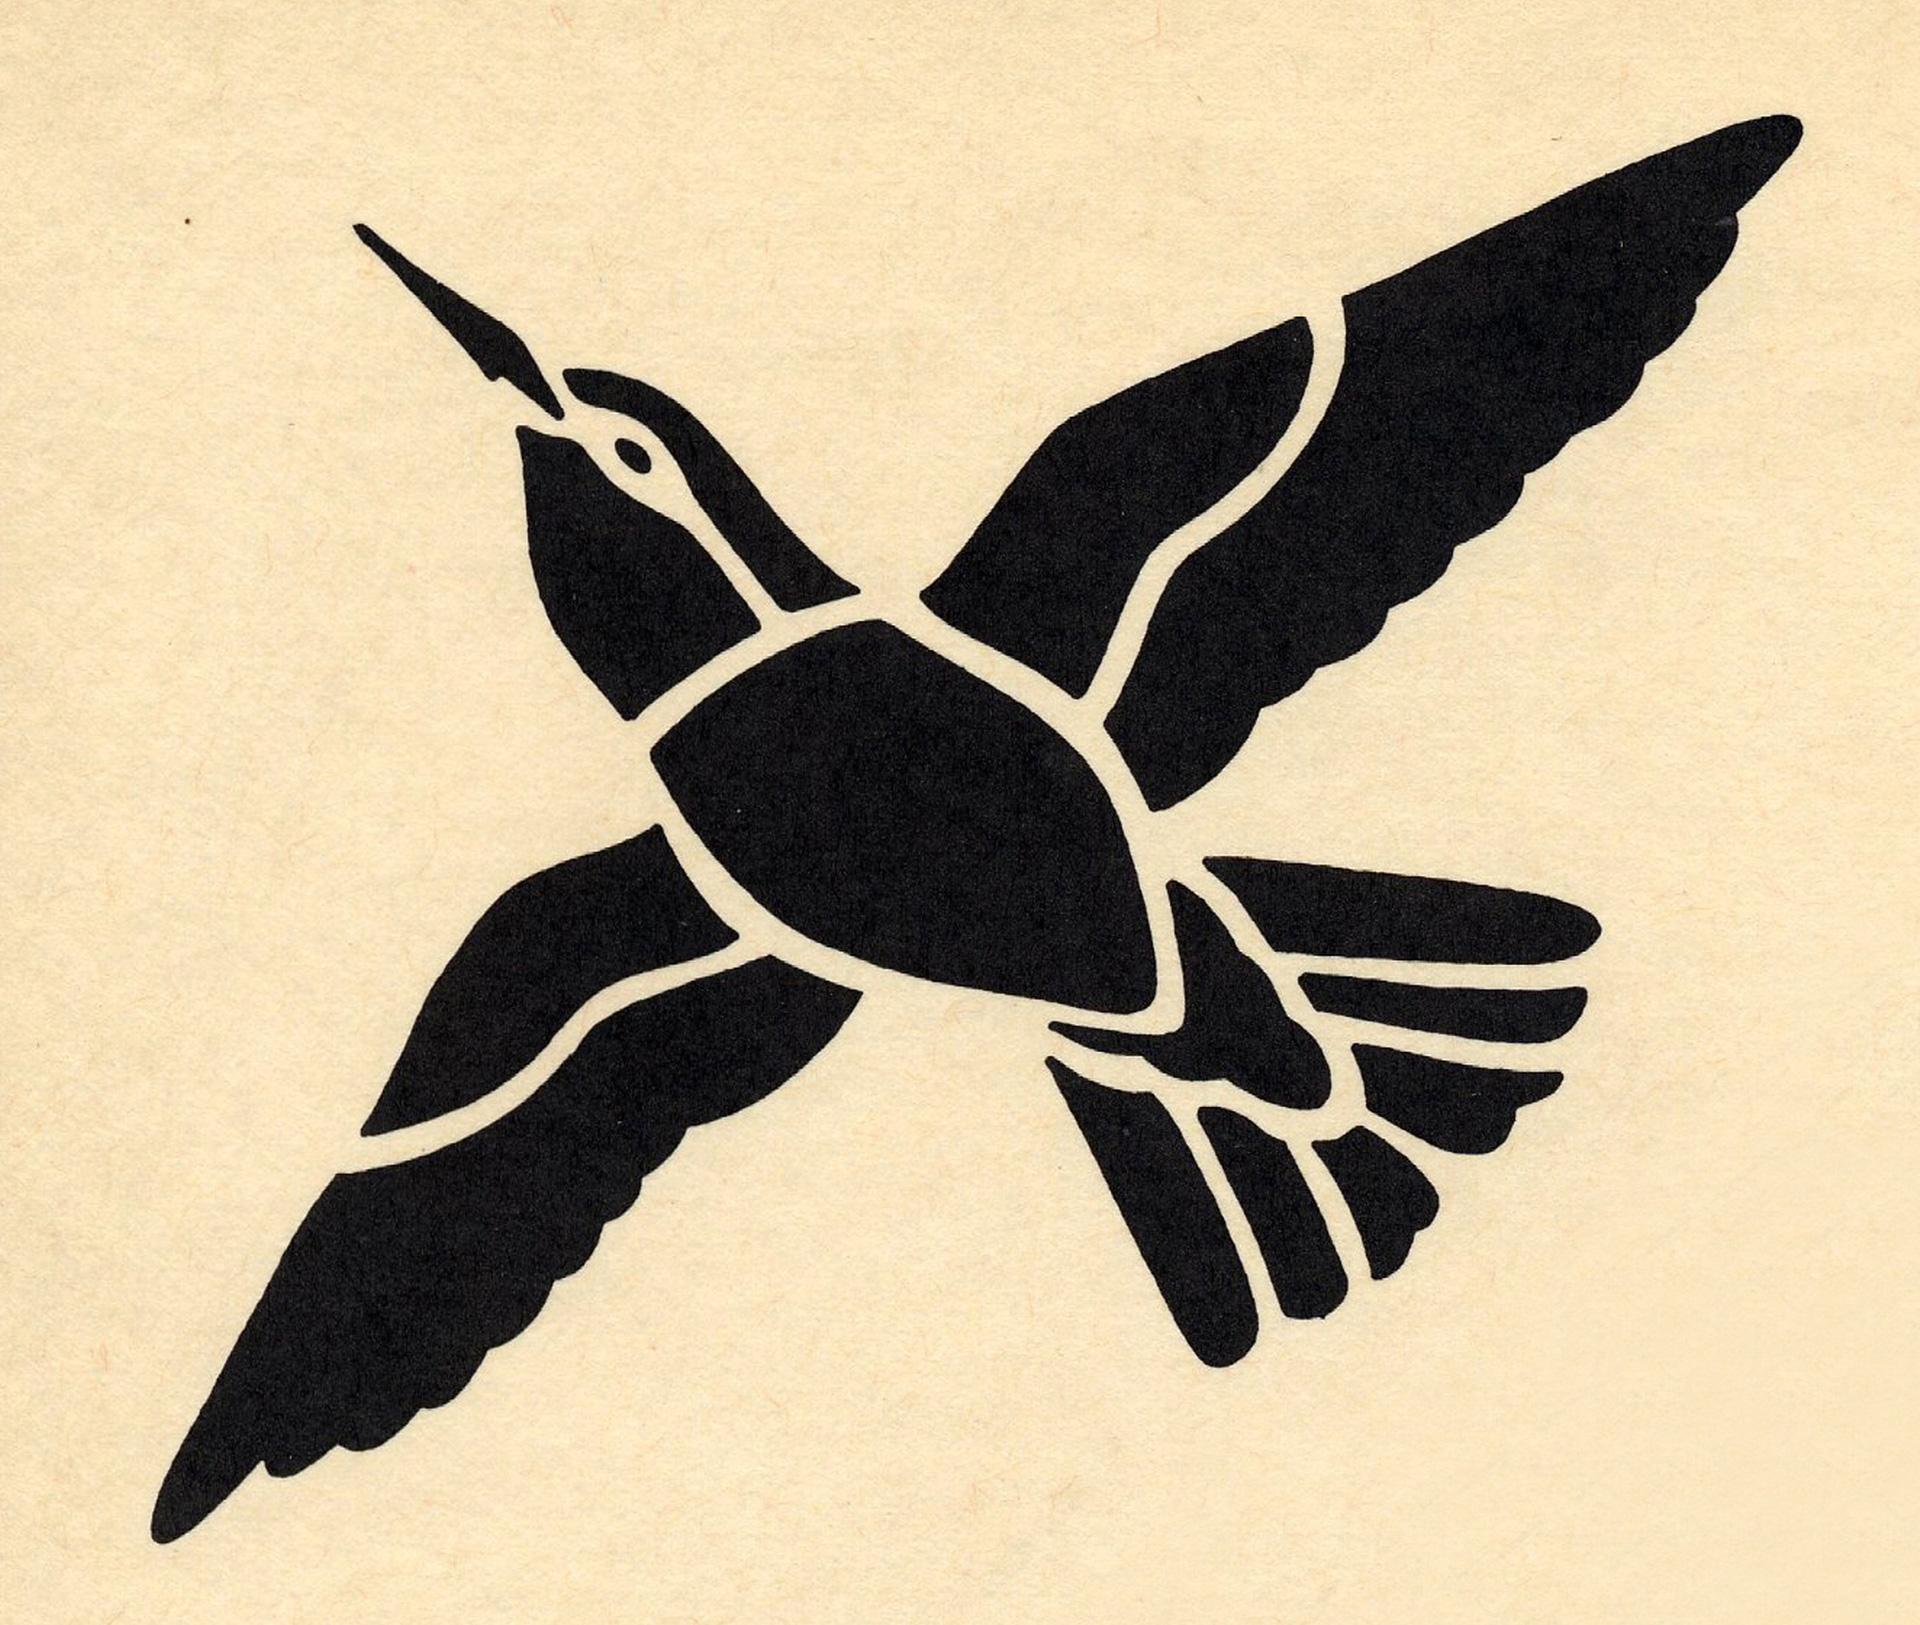 Galerie des pochoirs oiseaux loisirs creatifs de f1adc for Pochoir oiseau